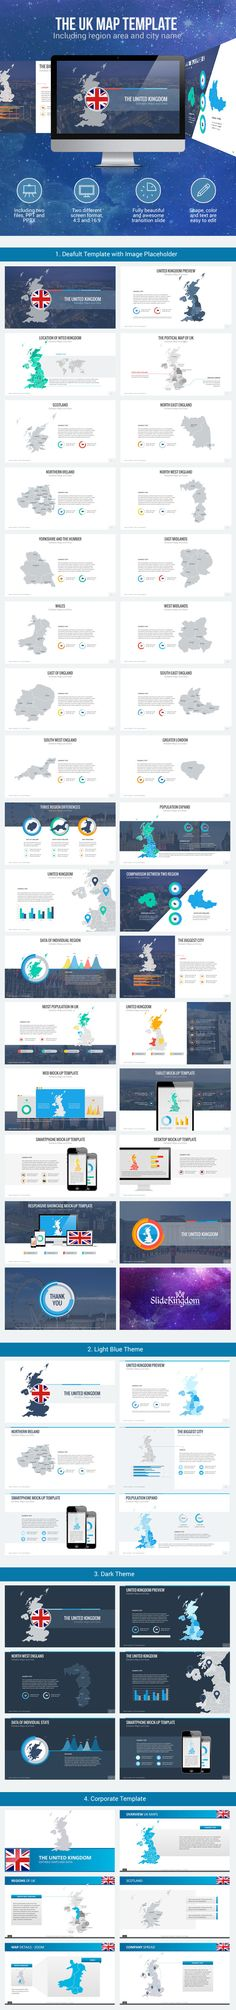 United Kingdom Maps (PowerPoint Templates)